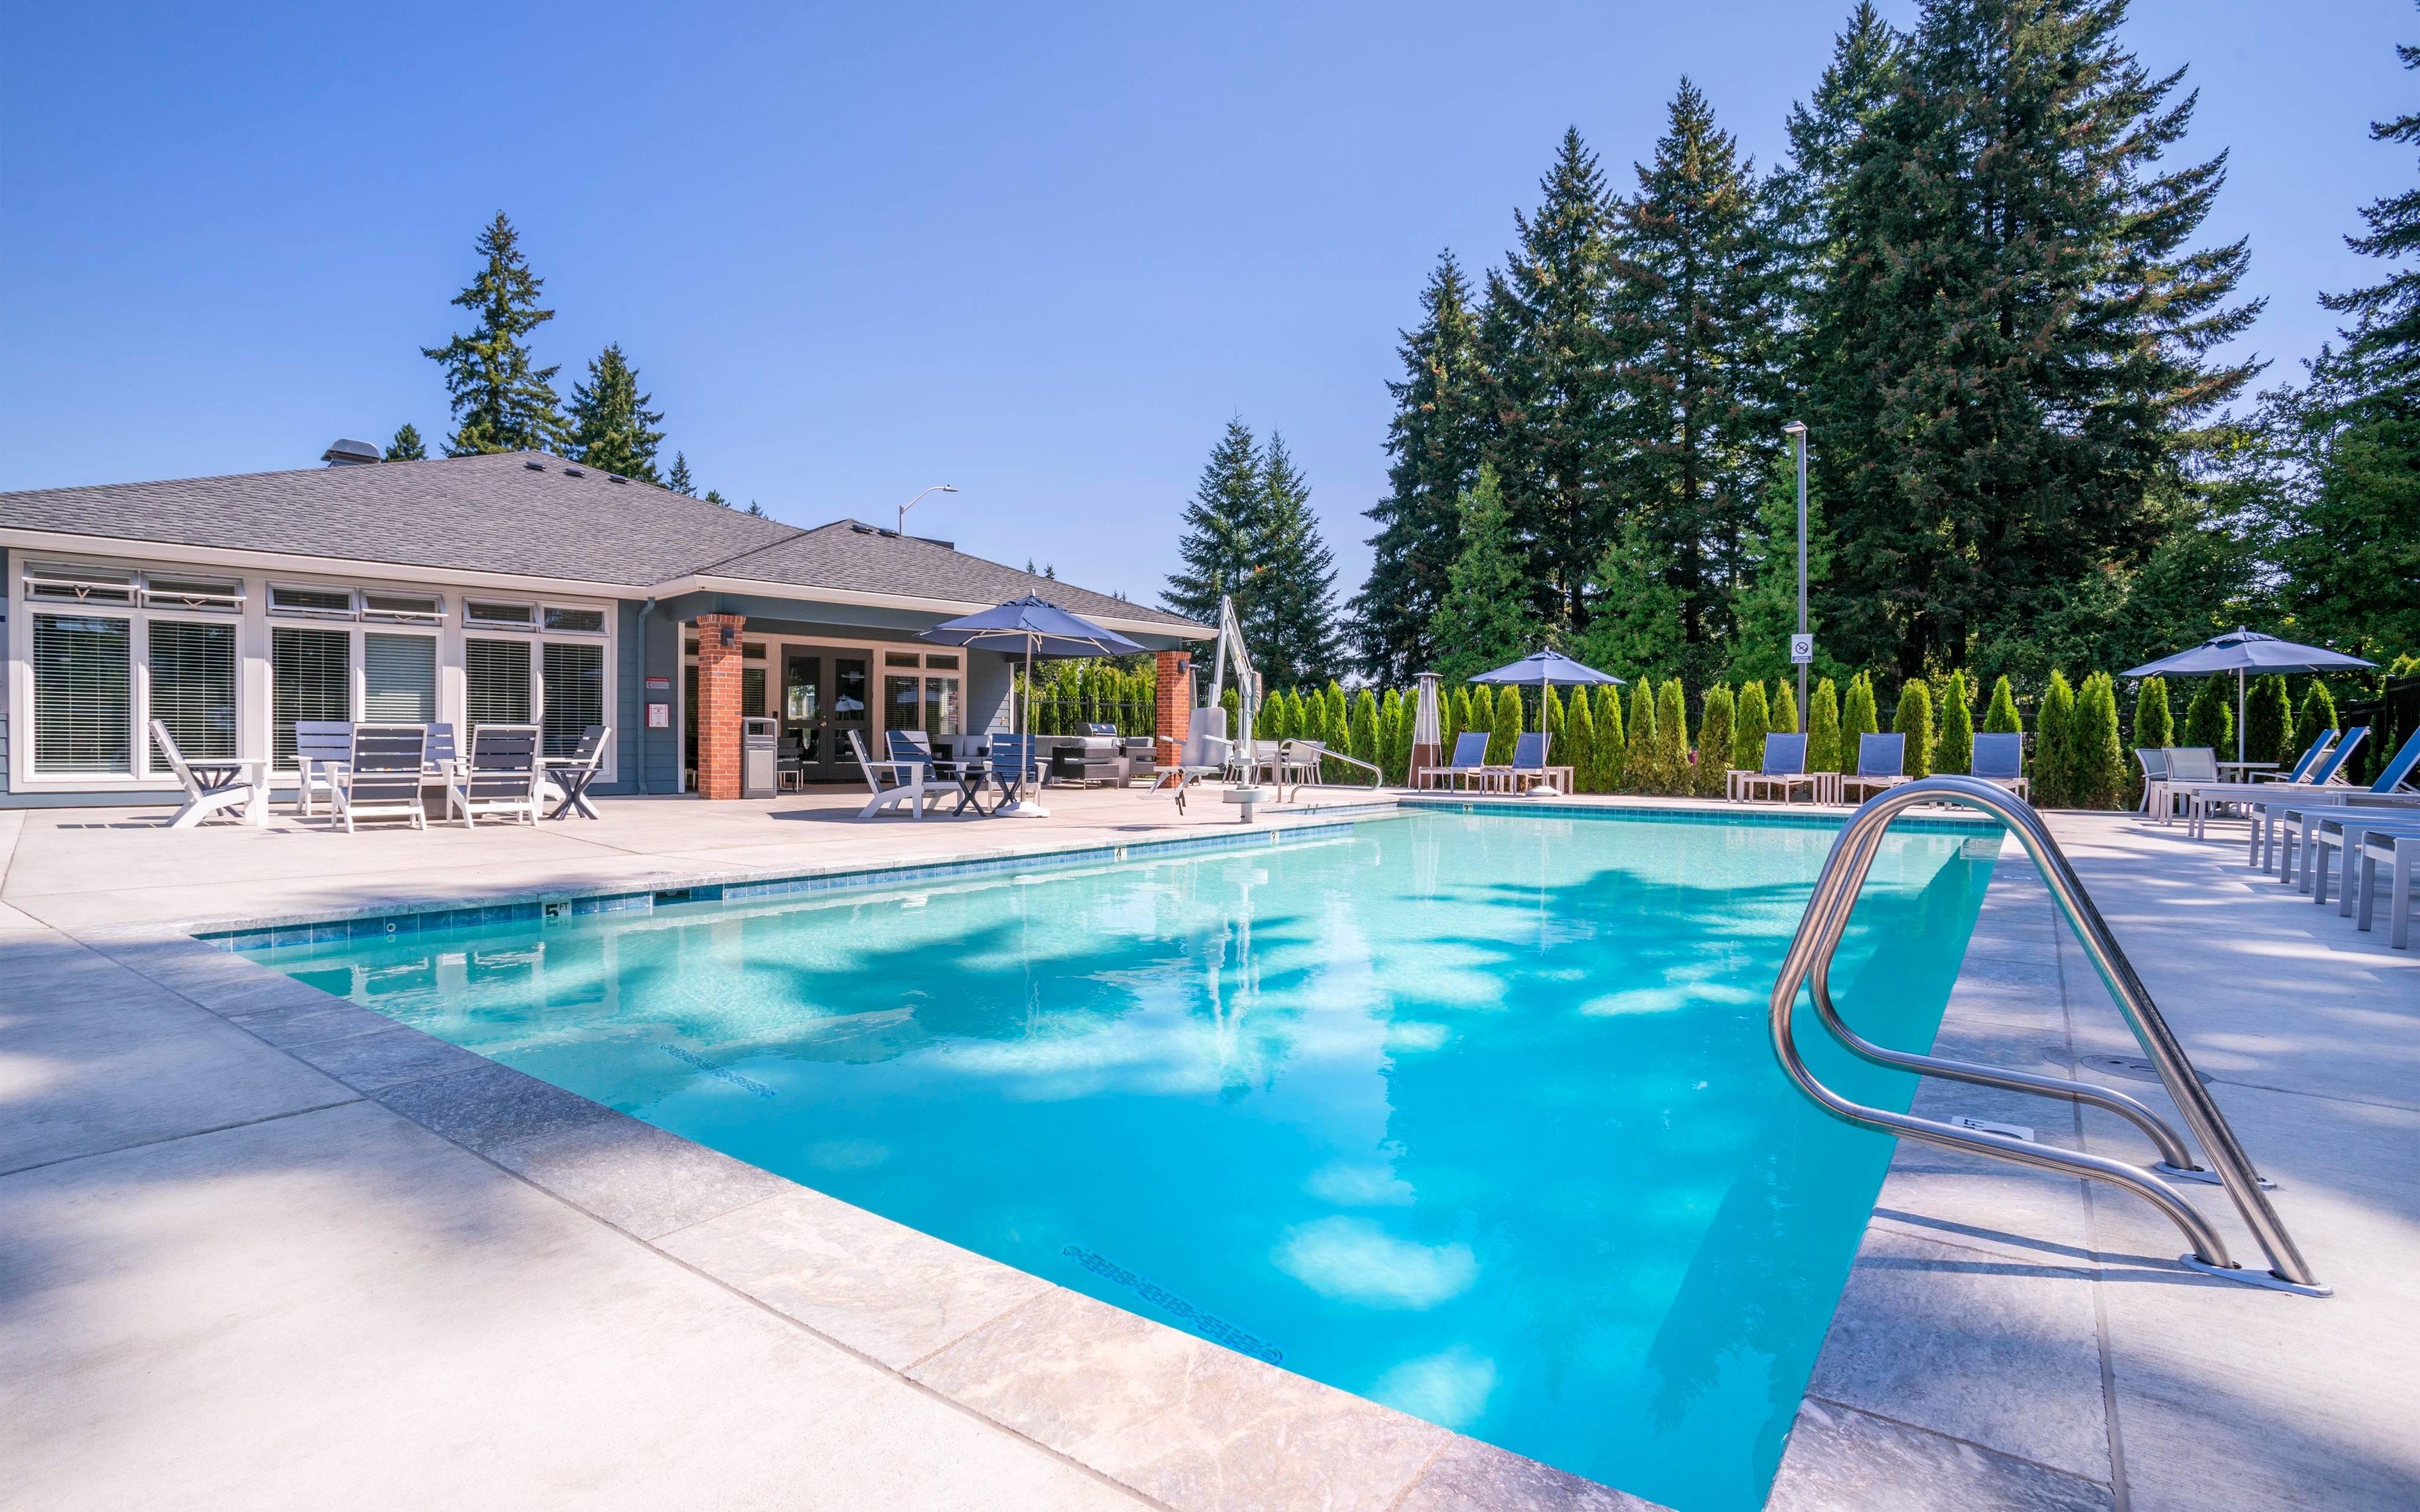 vancouver wa apartment pool